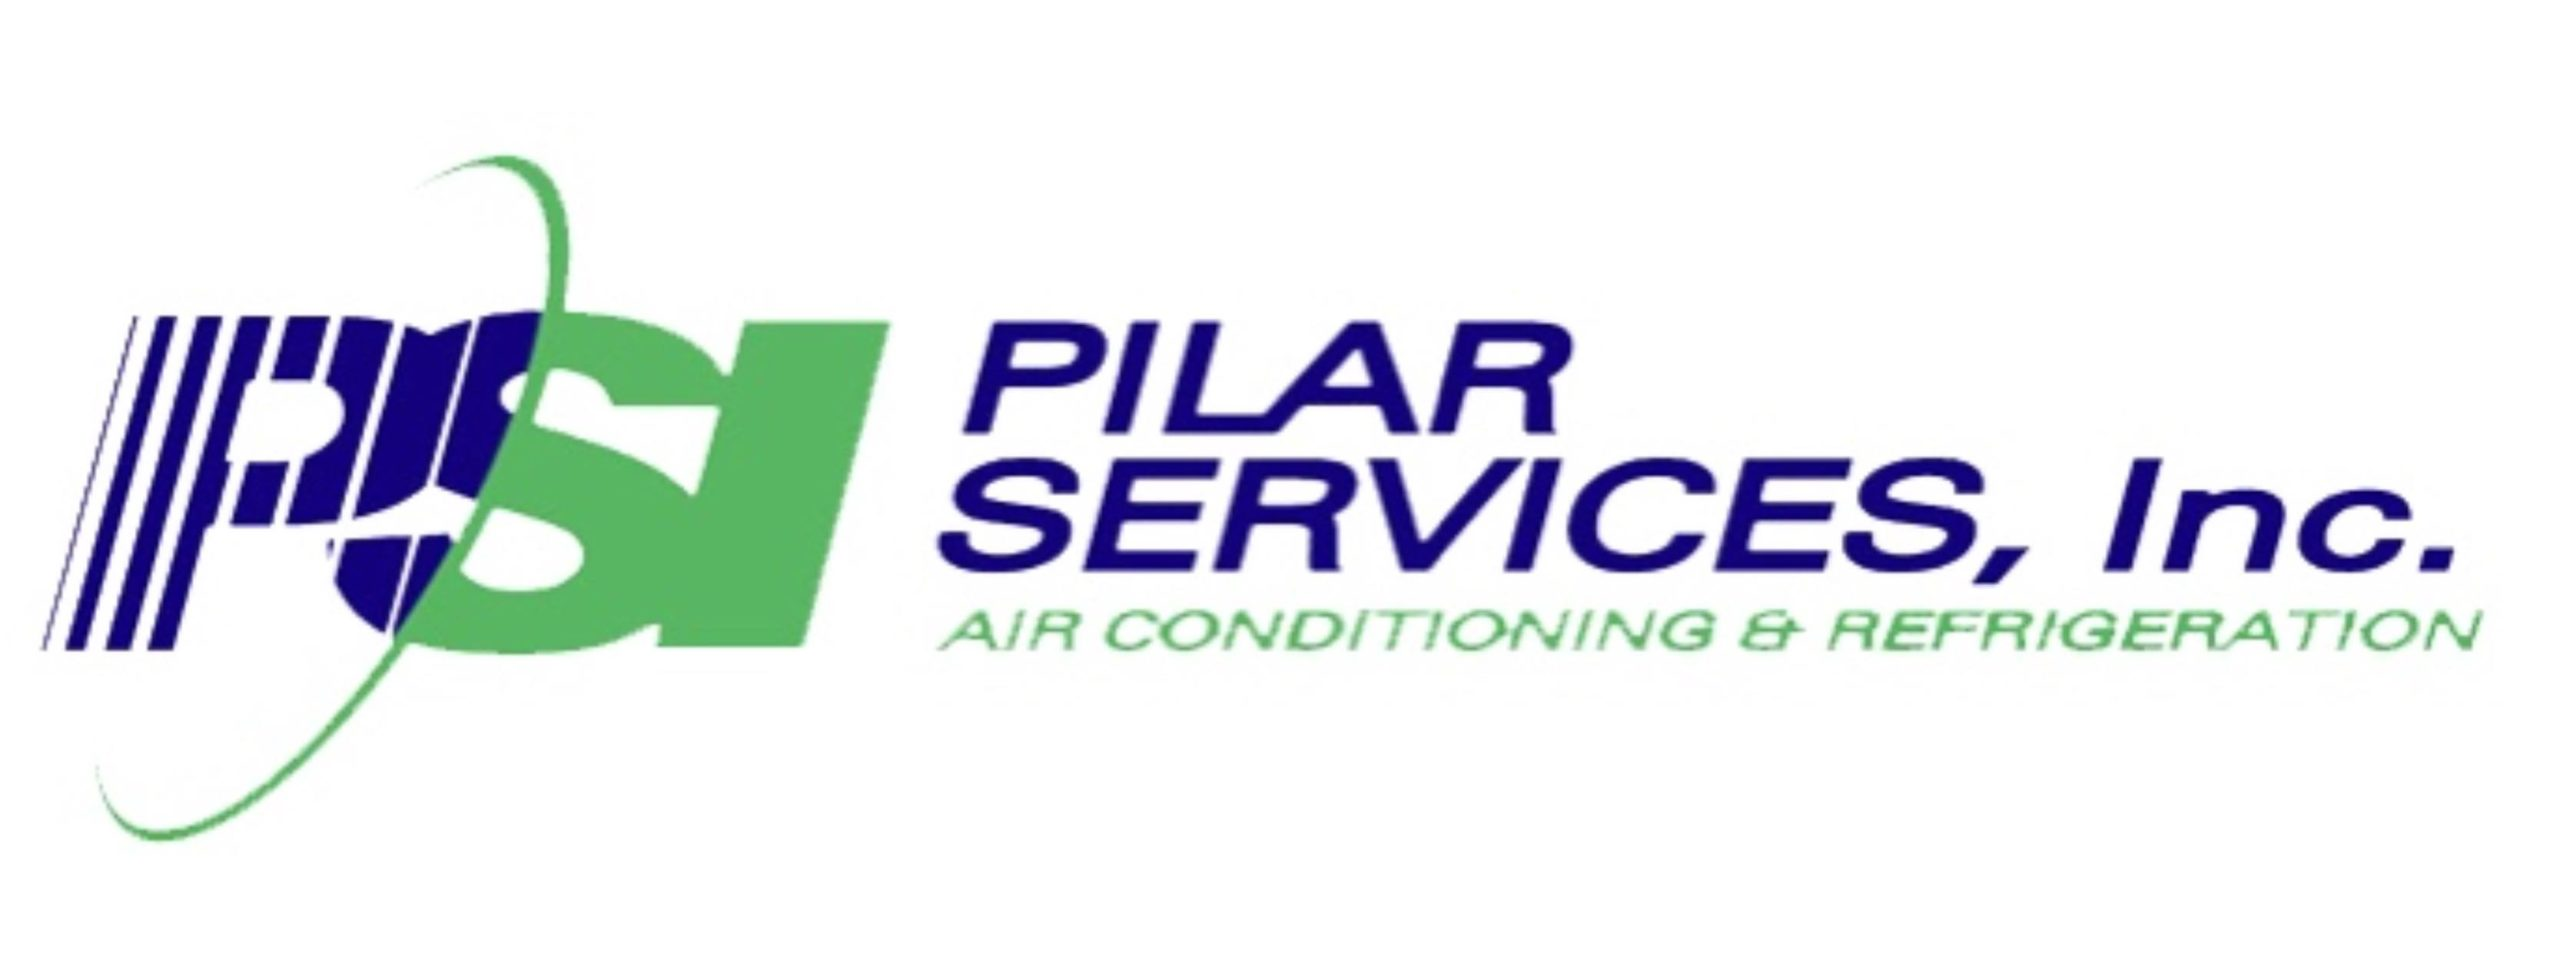 Pilar Services, Inc. Air Conditioning & Refrigeration company logo